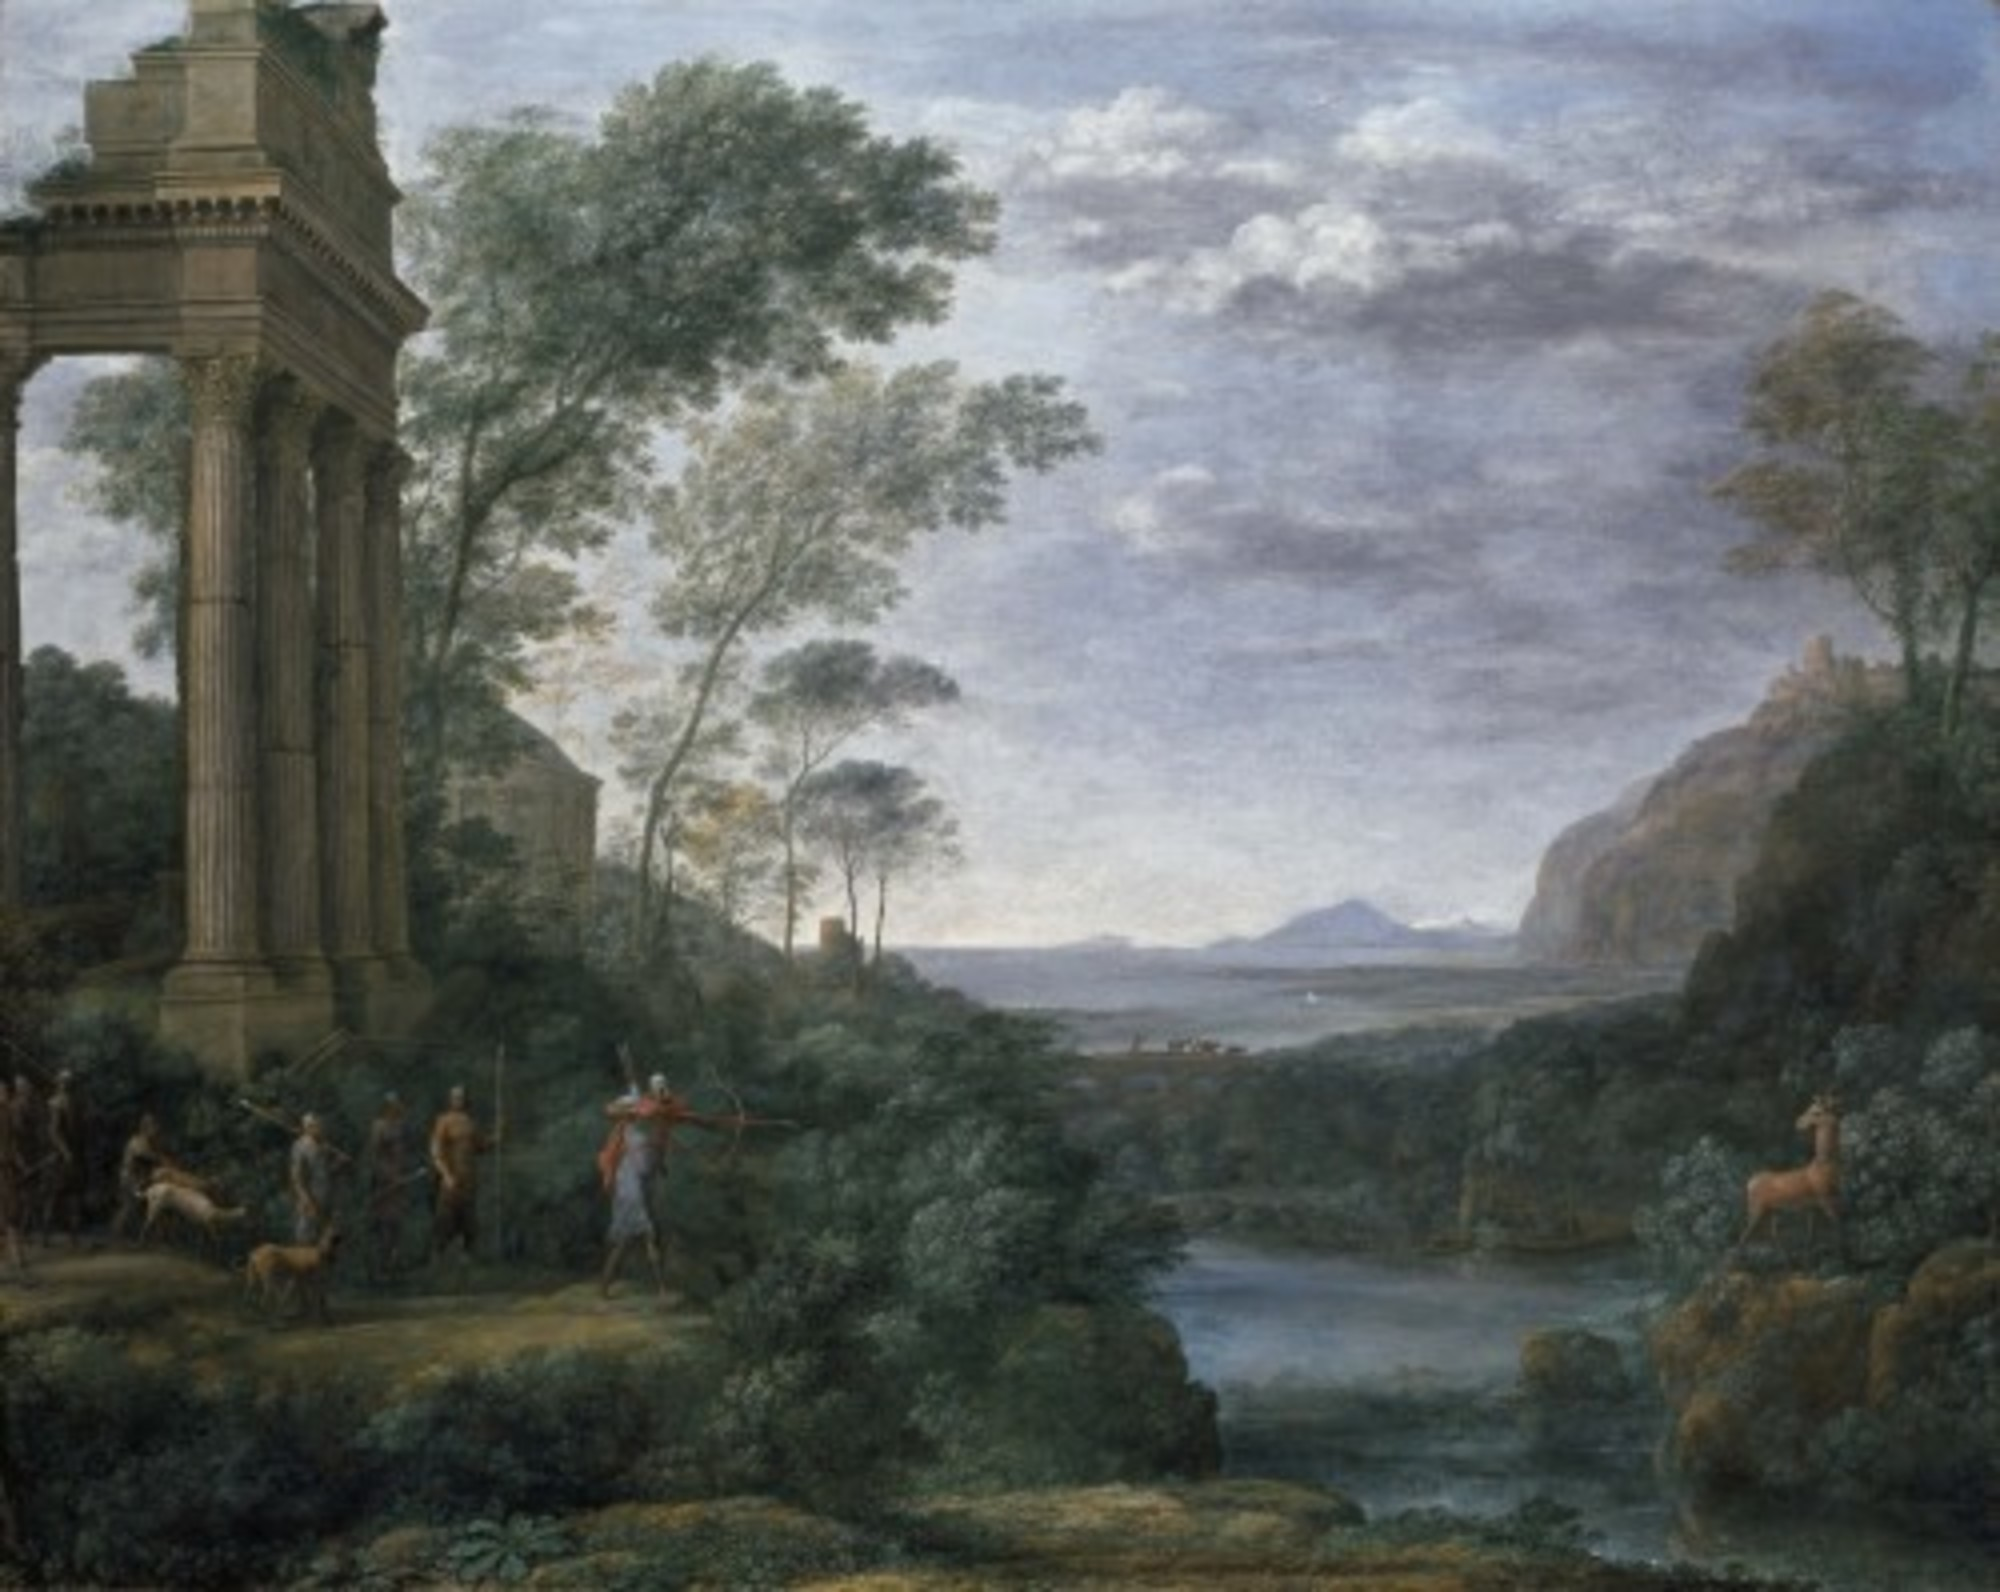 Ascanius-Shooting-the-Stag-of-Sylvia-1682-Claude-Lorrain.jpg